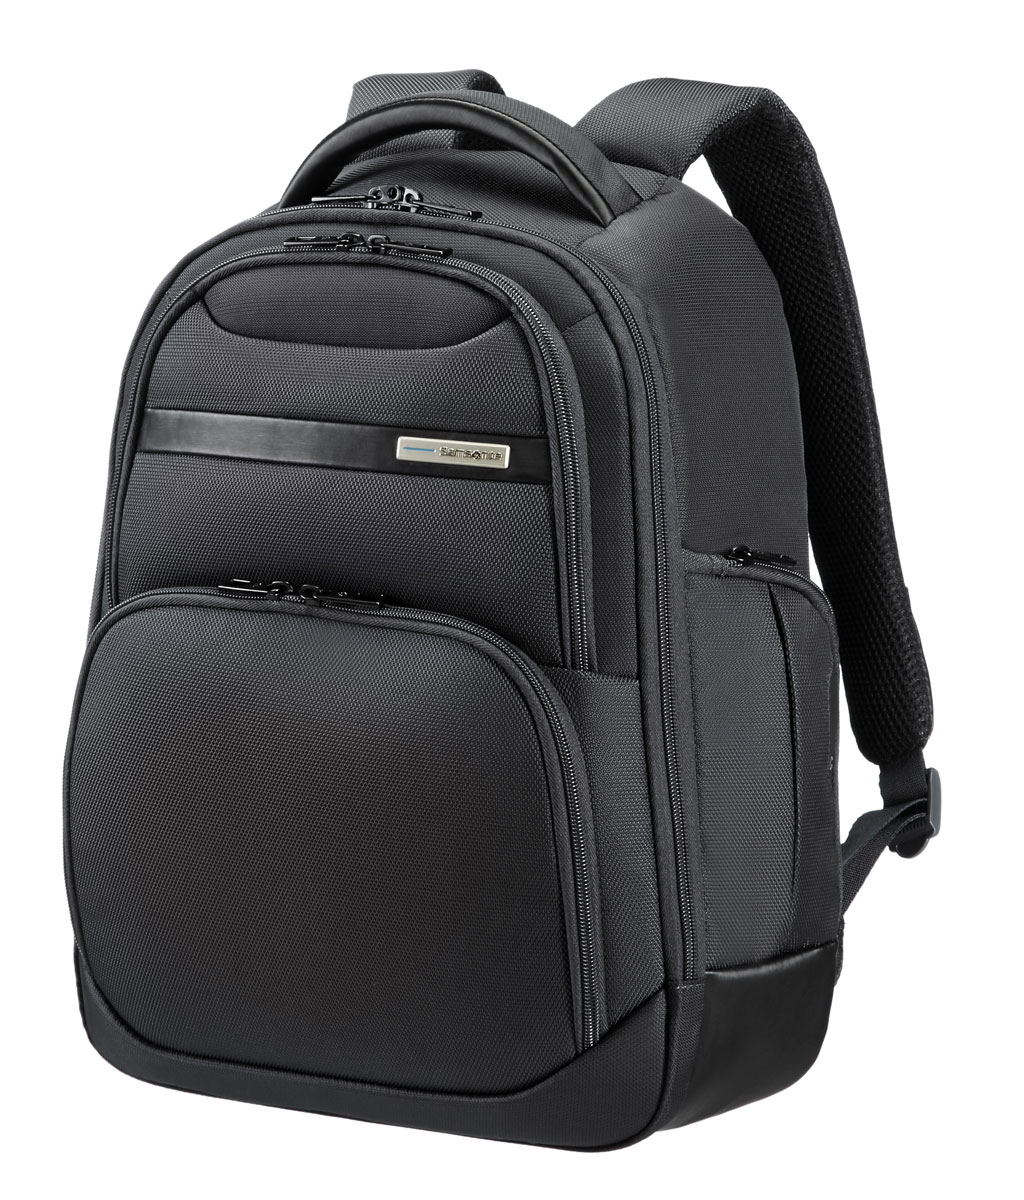 Рюкзак для ноутбука Samsonite Guardit, цвет: черный, 15 л, 31,5 х 17,5 х 42 см рюкзак caribee trek цвет черный 32 л